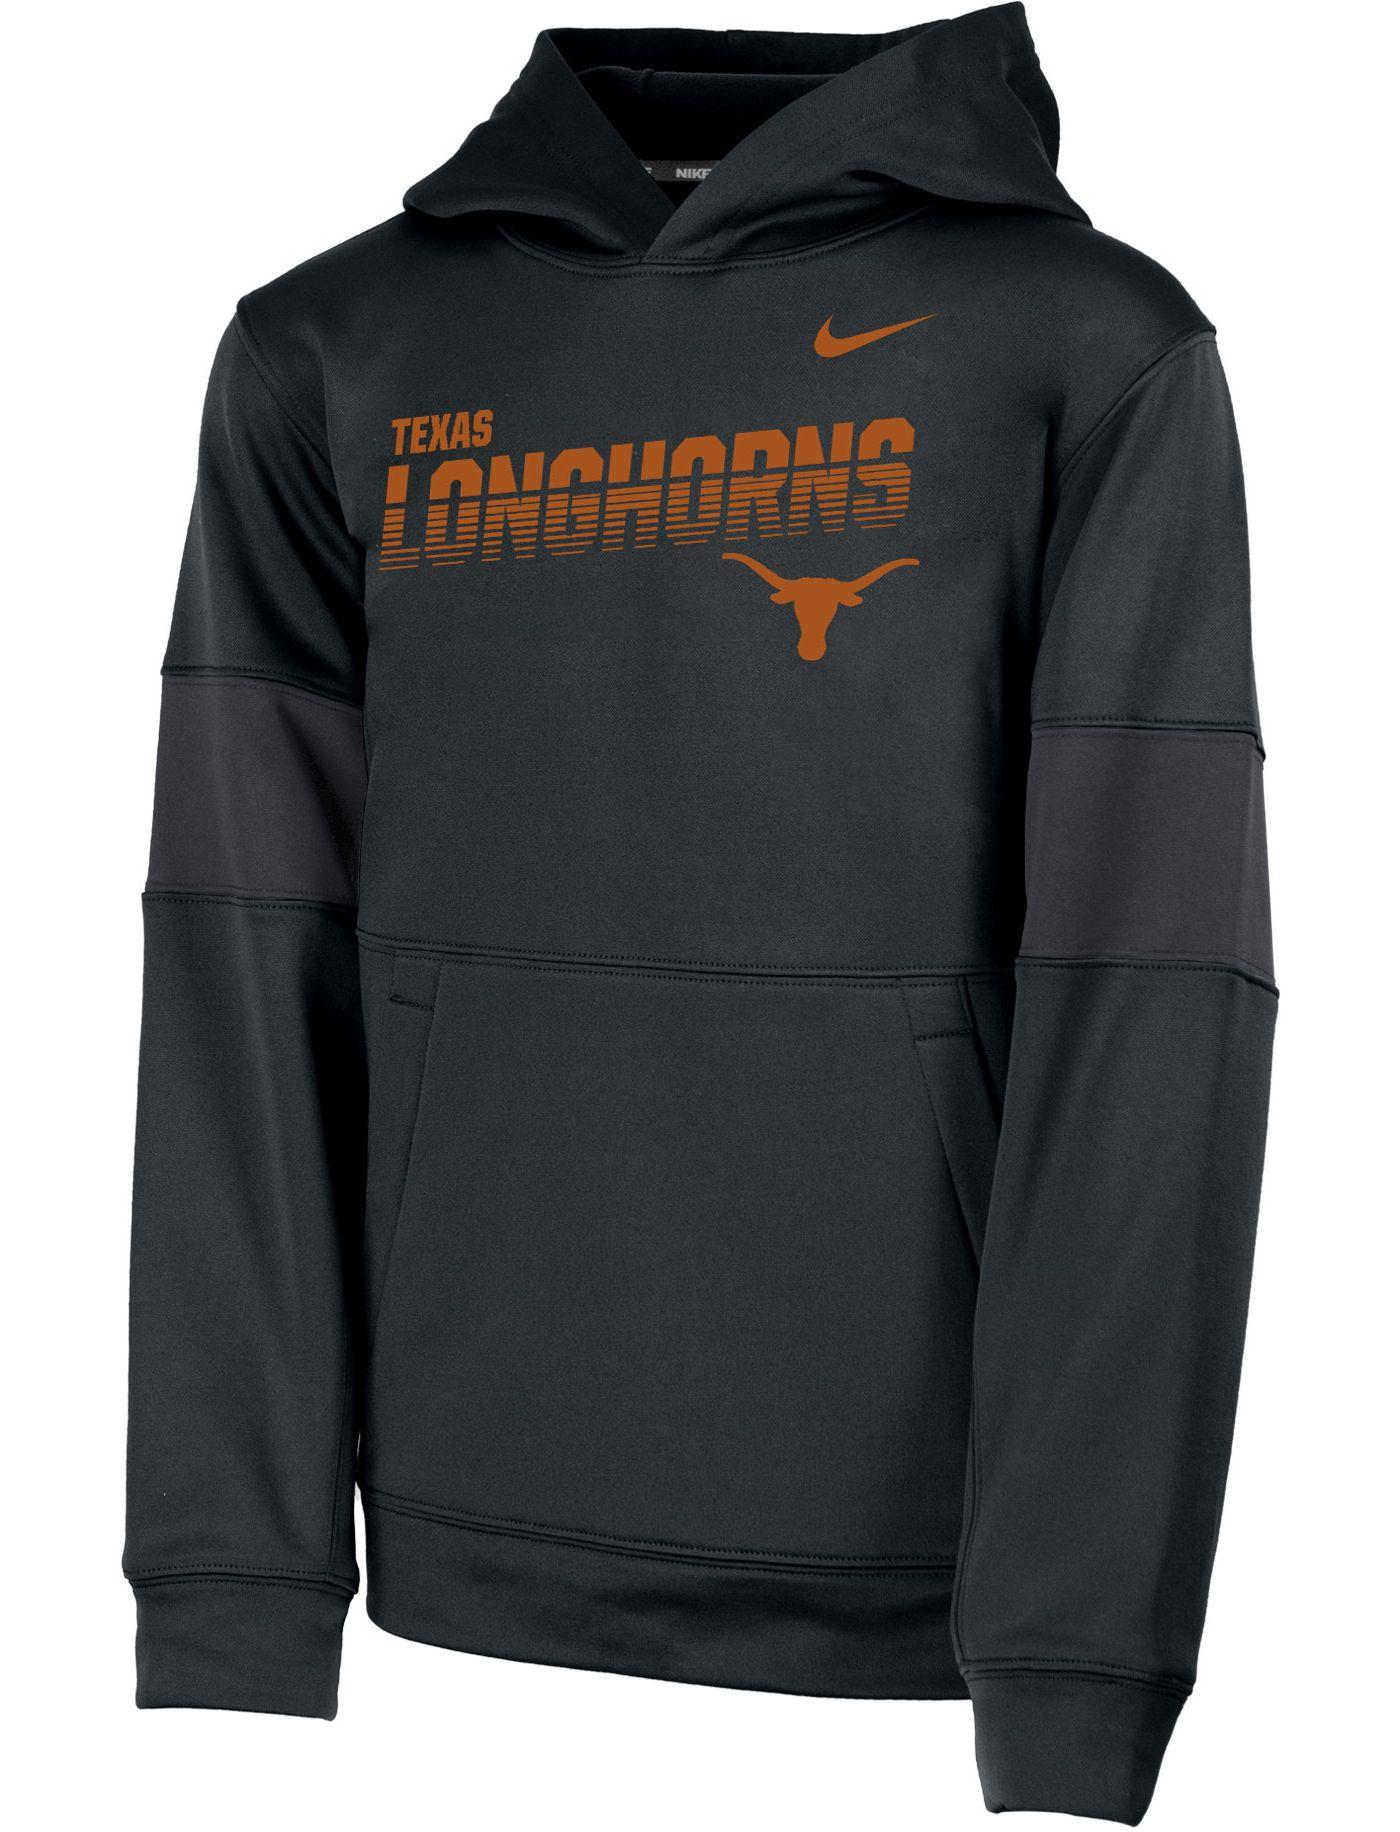 Nike Youth Texas Longhorns Therma Football Sideline Pullover Black Hoodie